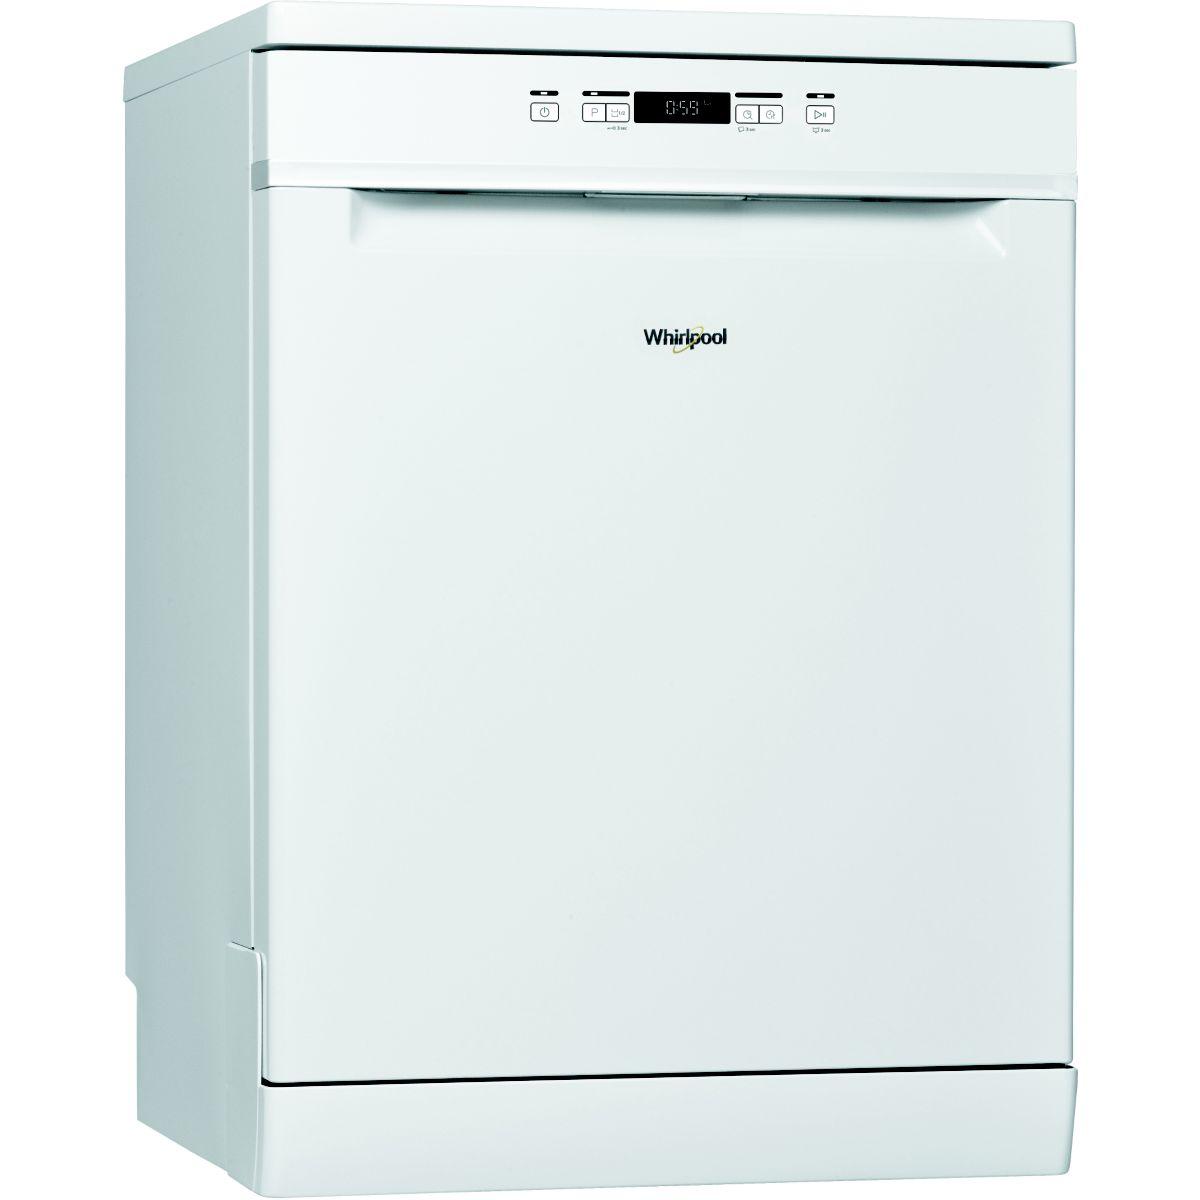 Lave-vaisselle 60cm WHIRLPOOL EX WFC 3B18 (photo)